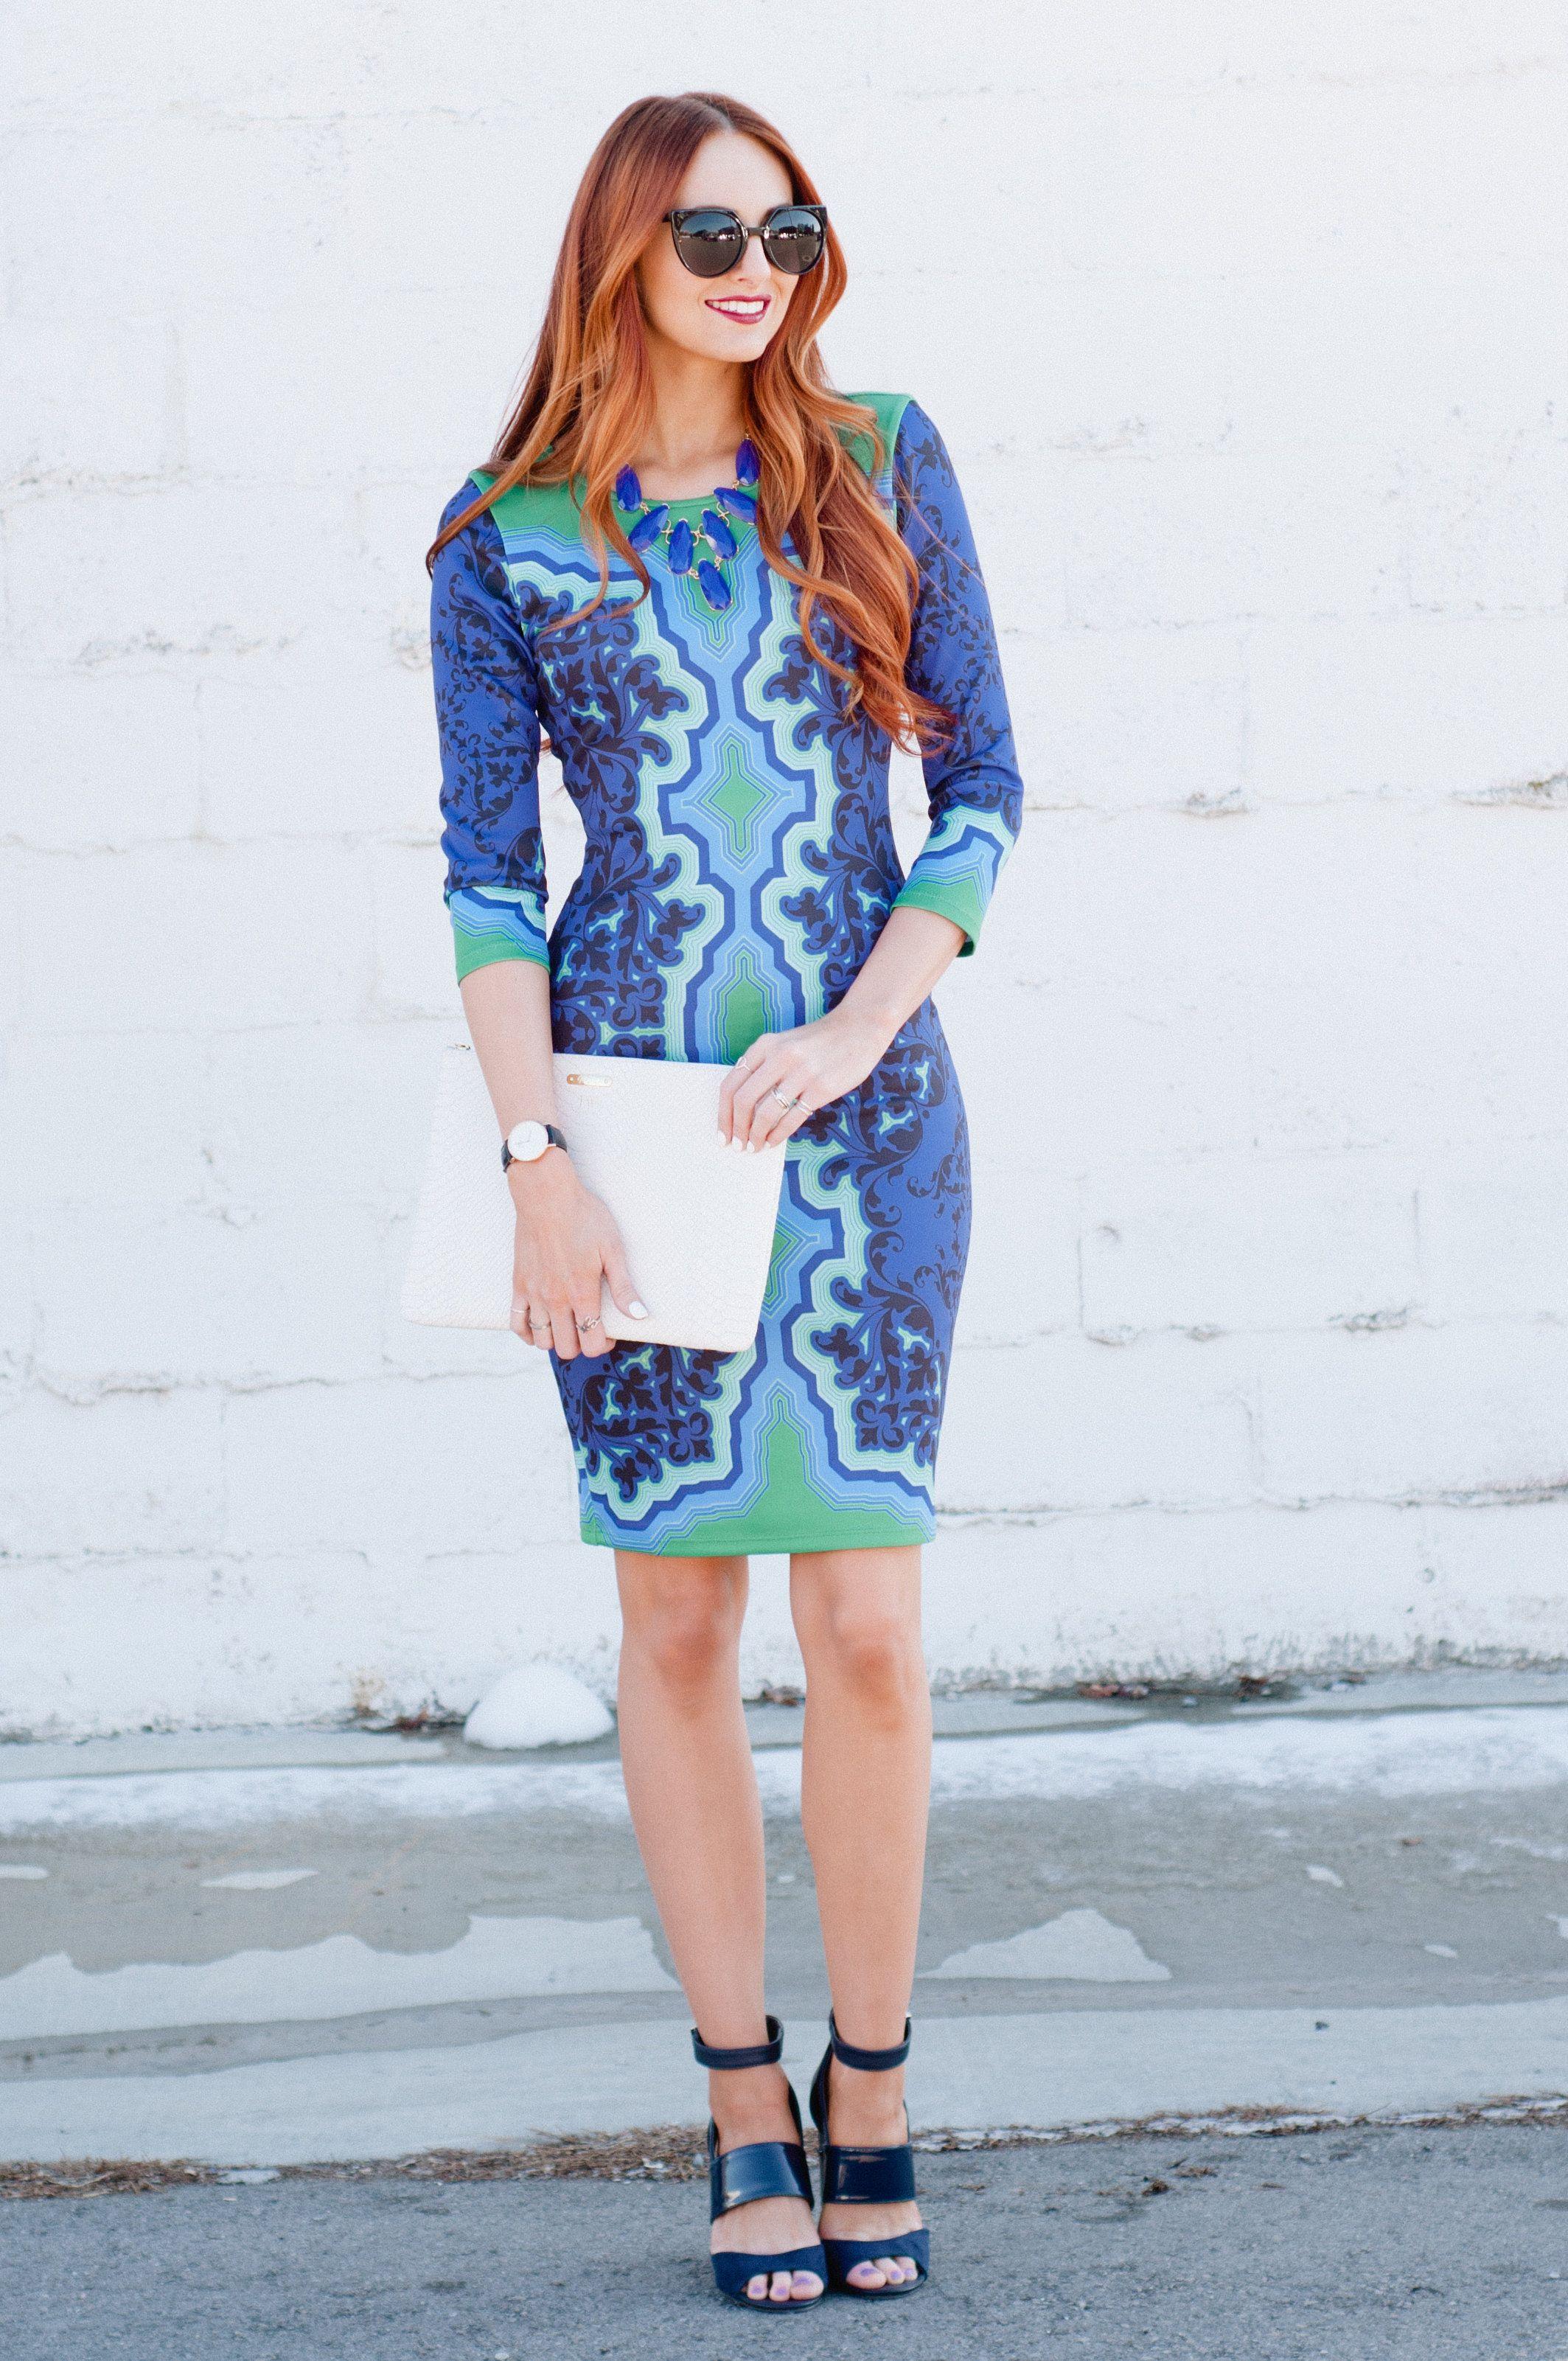 Gigi new york little j style fashion blog white uber clutch